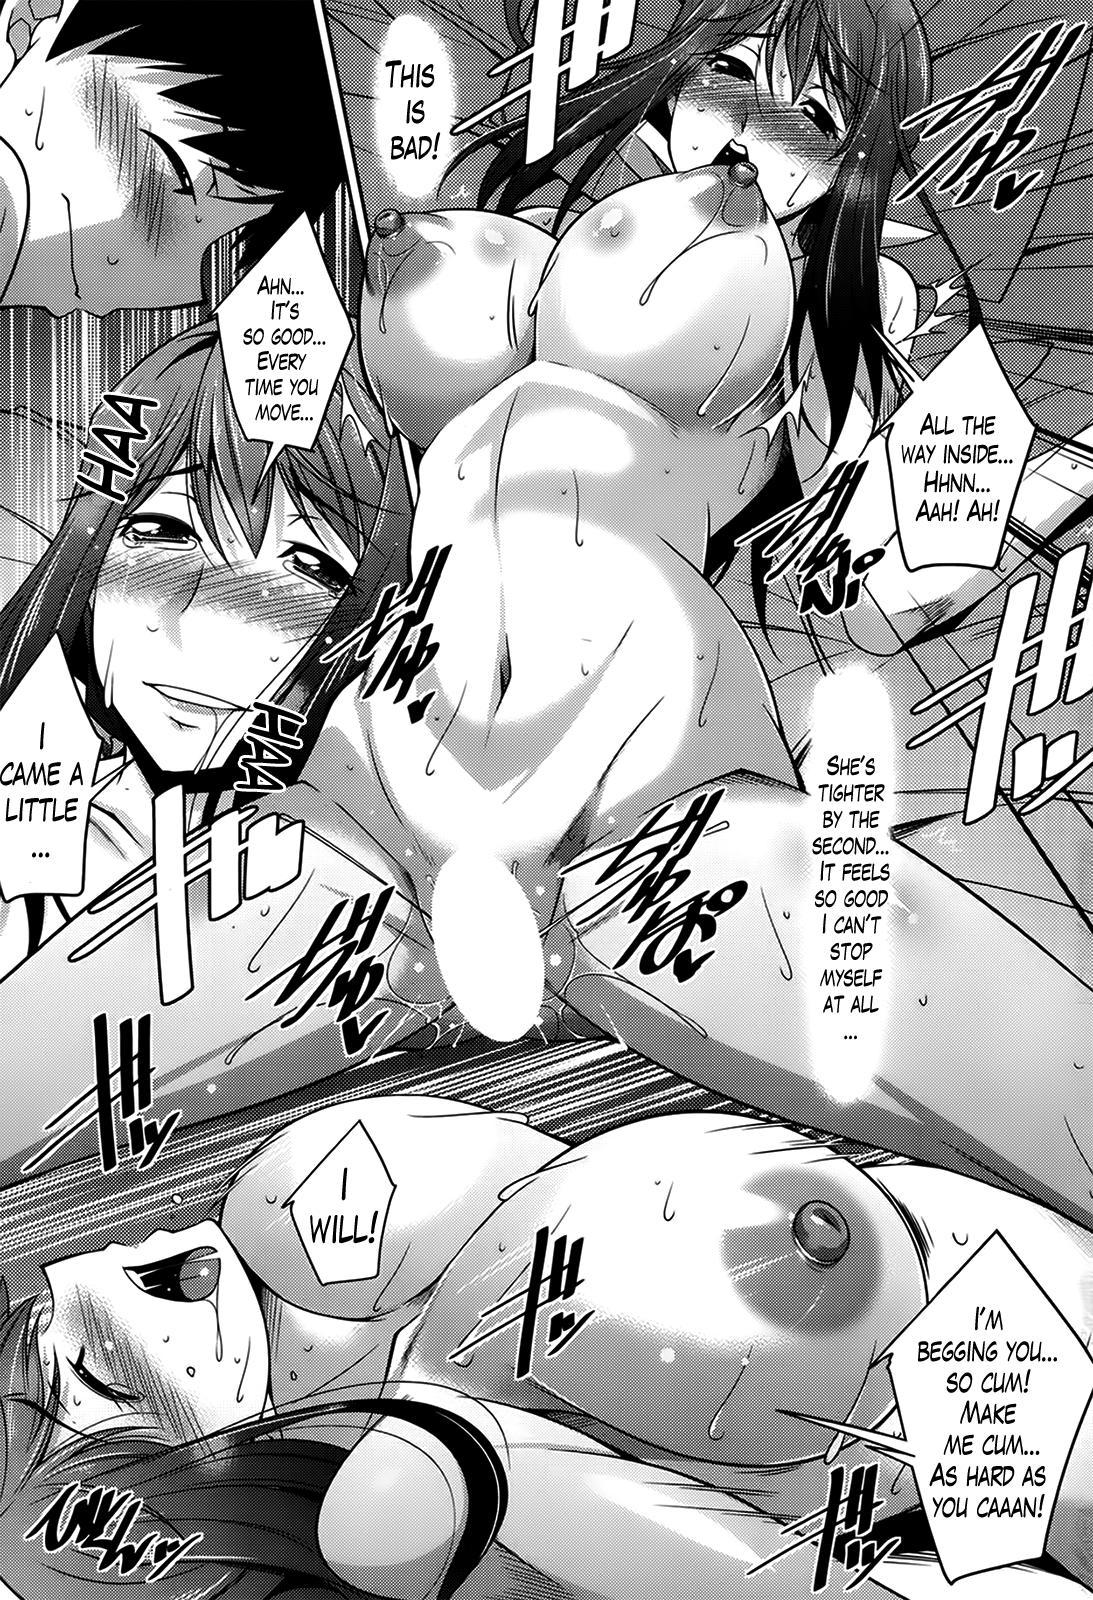 [Zen9] Taikutsu na Gogo no Sugoshikata Ch. 1-5   A Way to Spend a Boring Afternoon Ch. 1-5 (Action Pizazz DX 2013-12) [English](hentai2read.com)[Lazarus H] 72